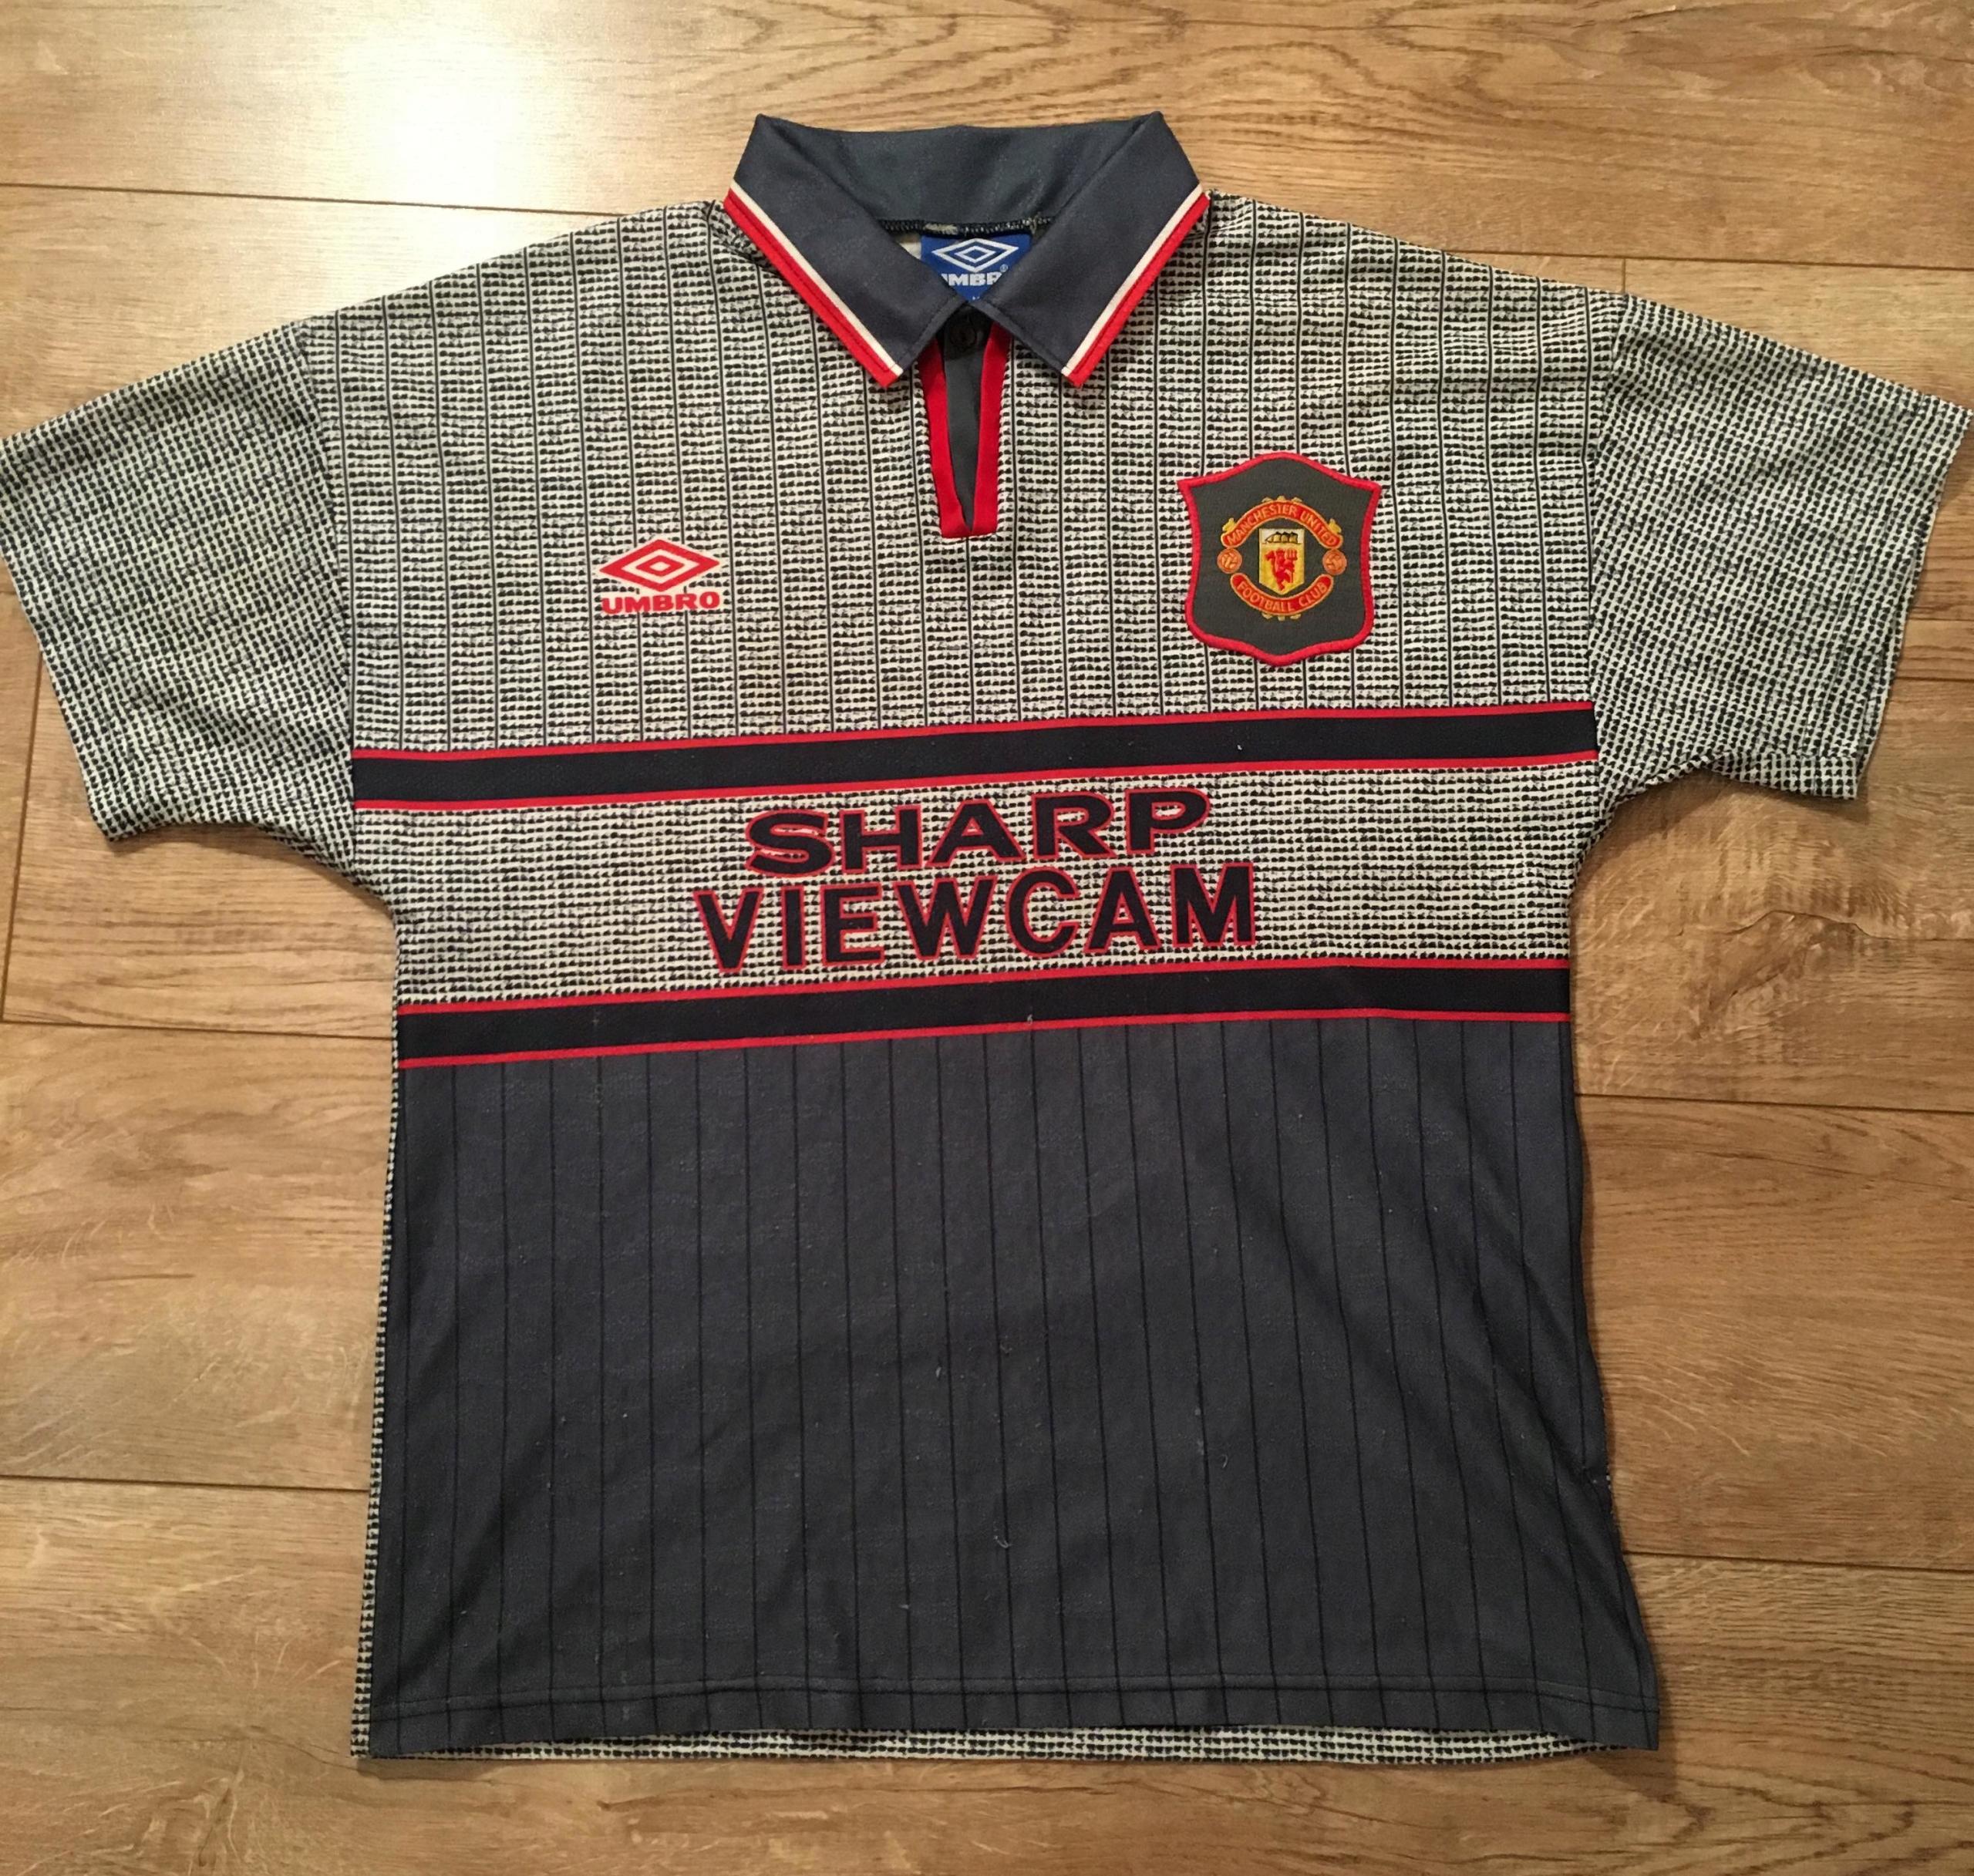 Koszulka Umbro Manchester United 1995 ! Rozmiar M